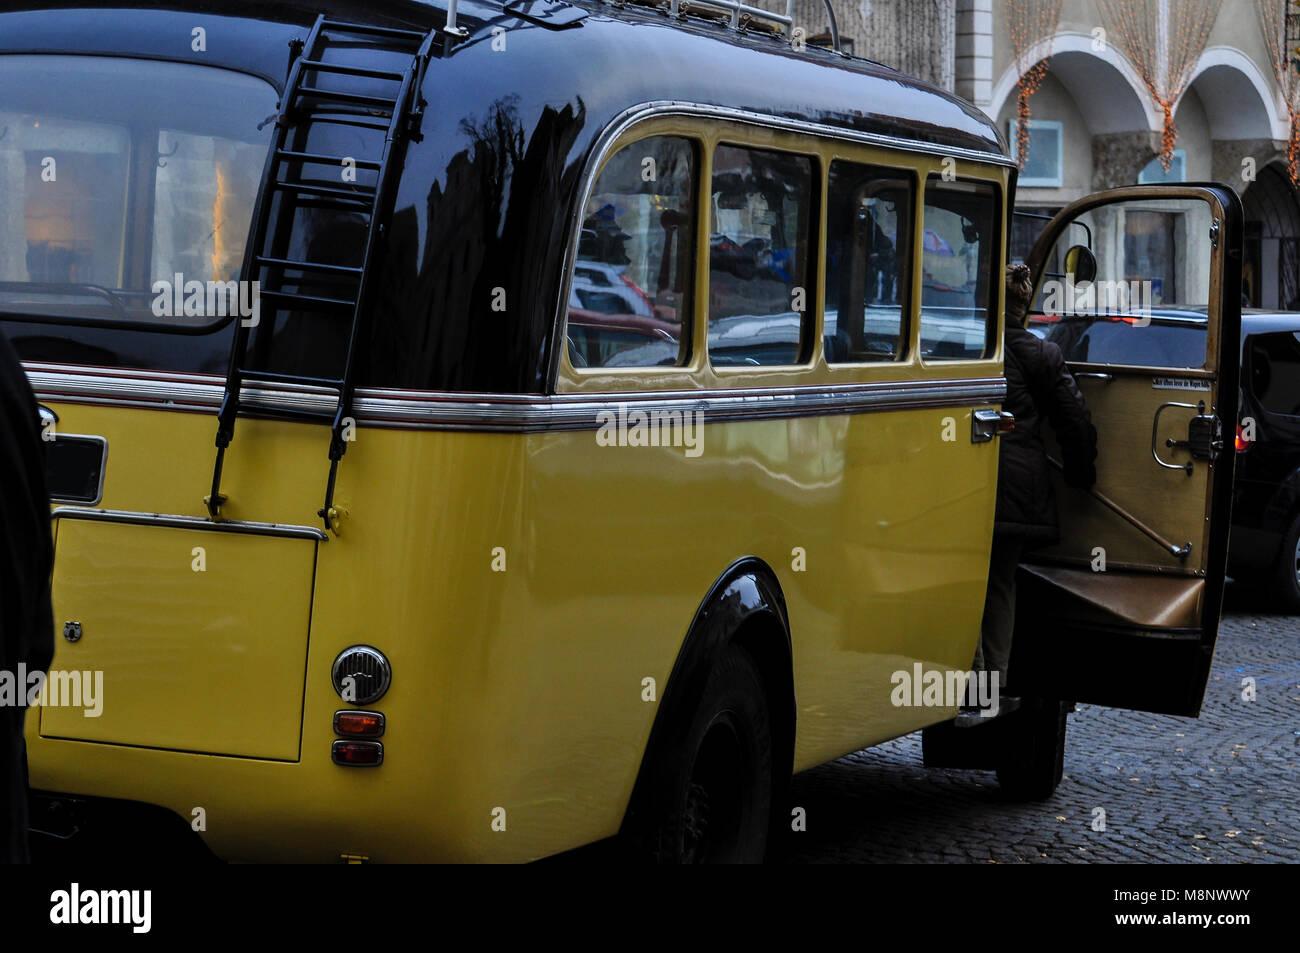 Alter Postautobus in Steyr - Stock Image